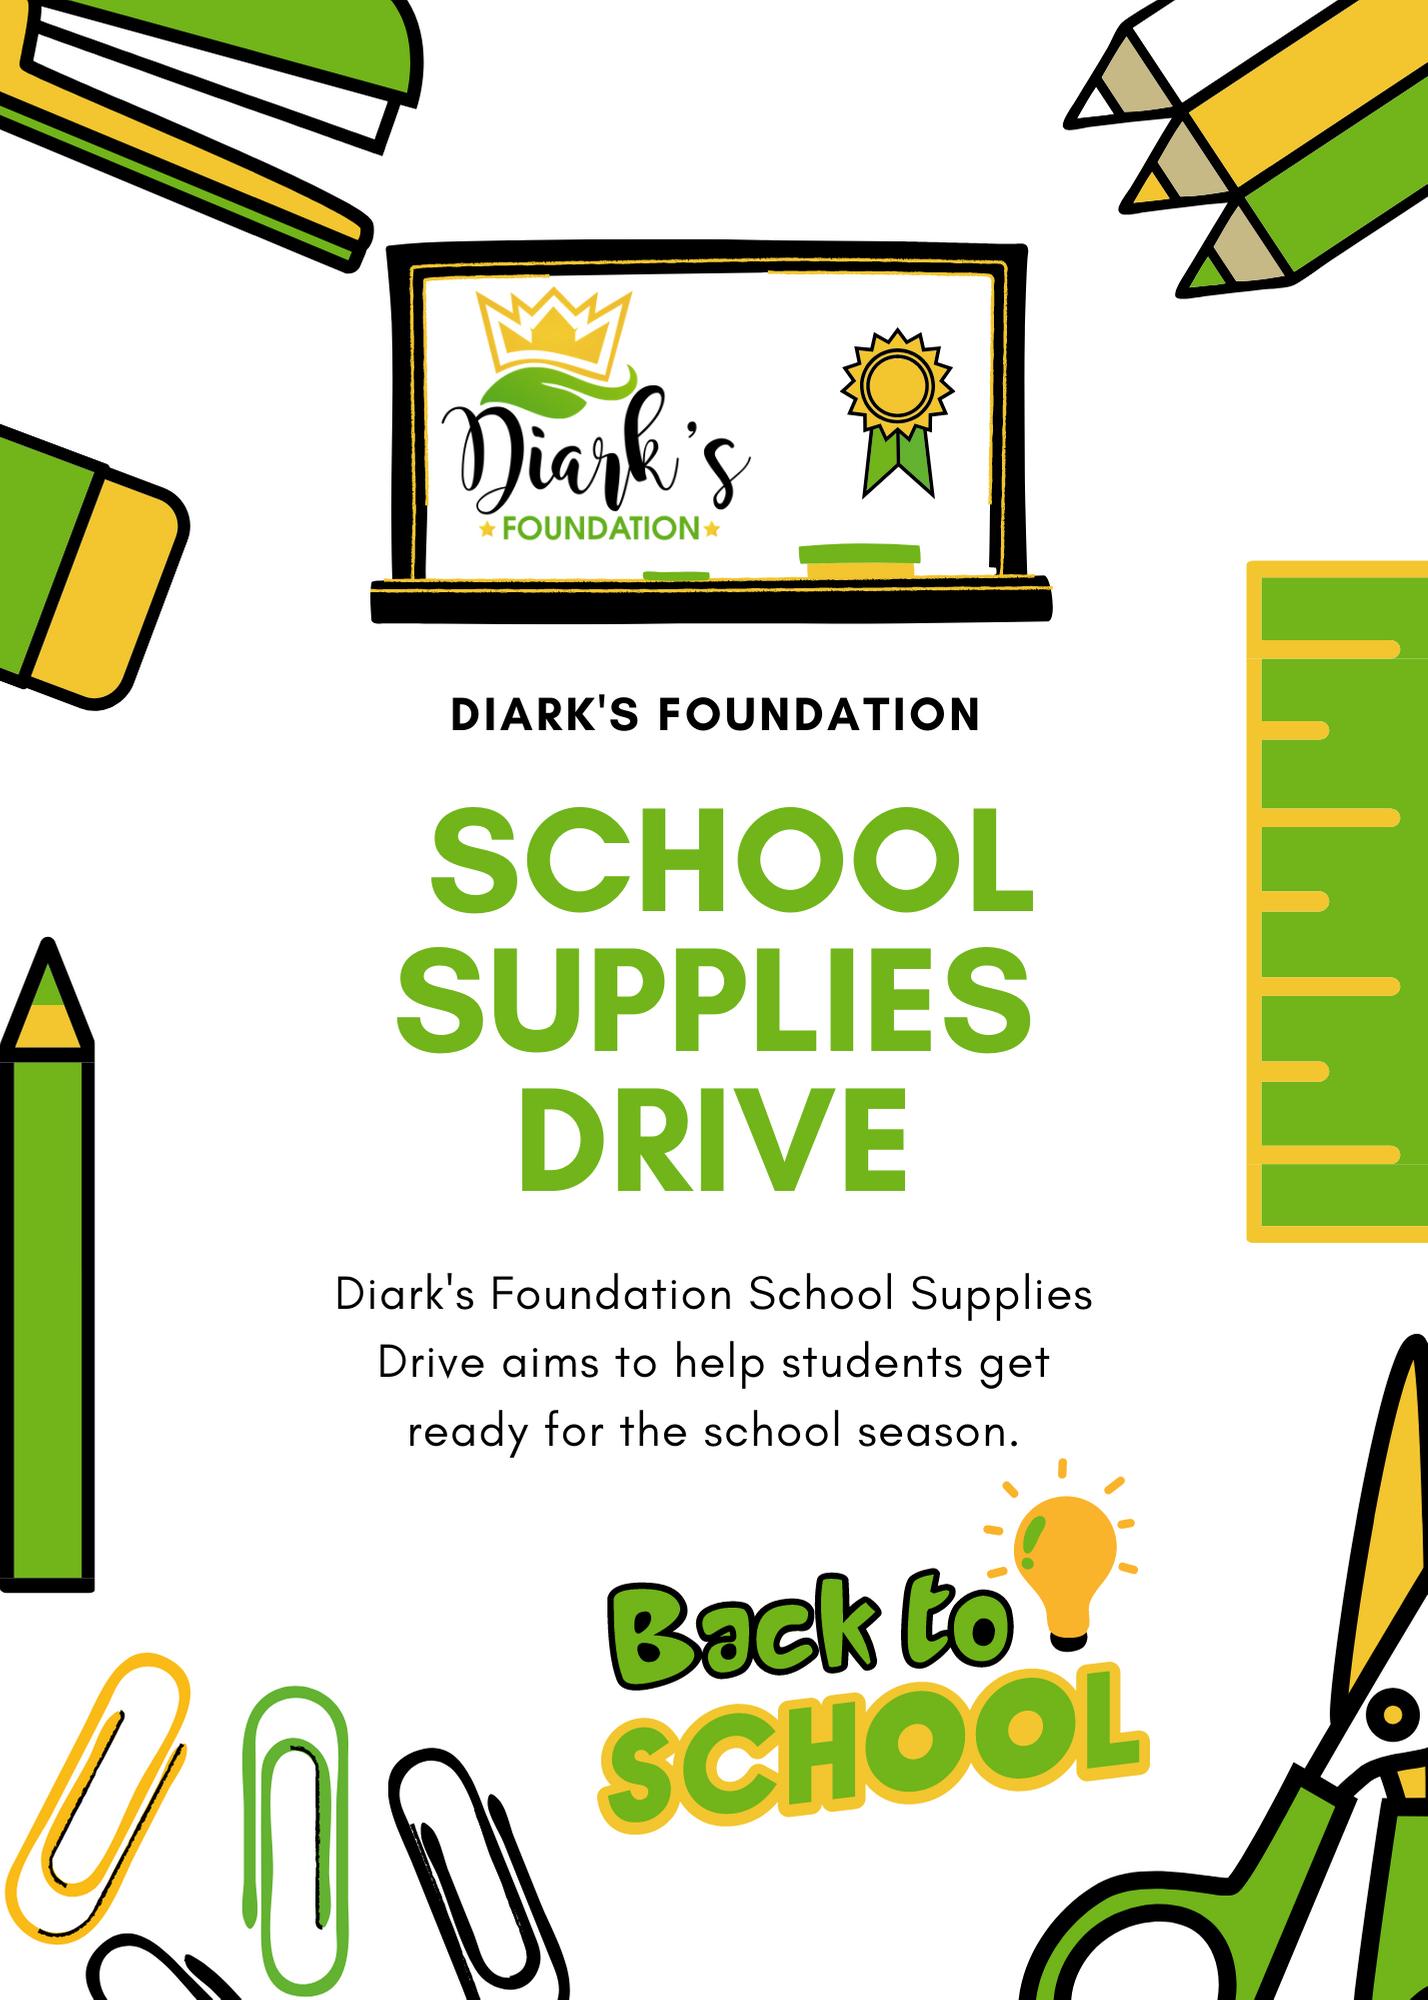 Diark's Foundation School Drive